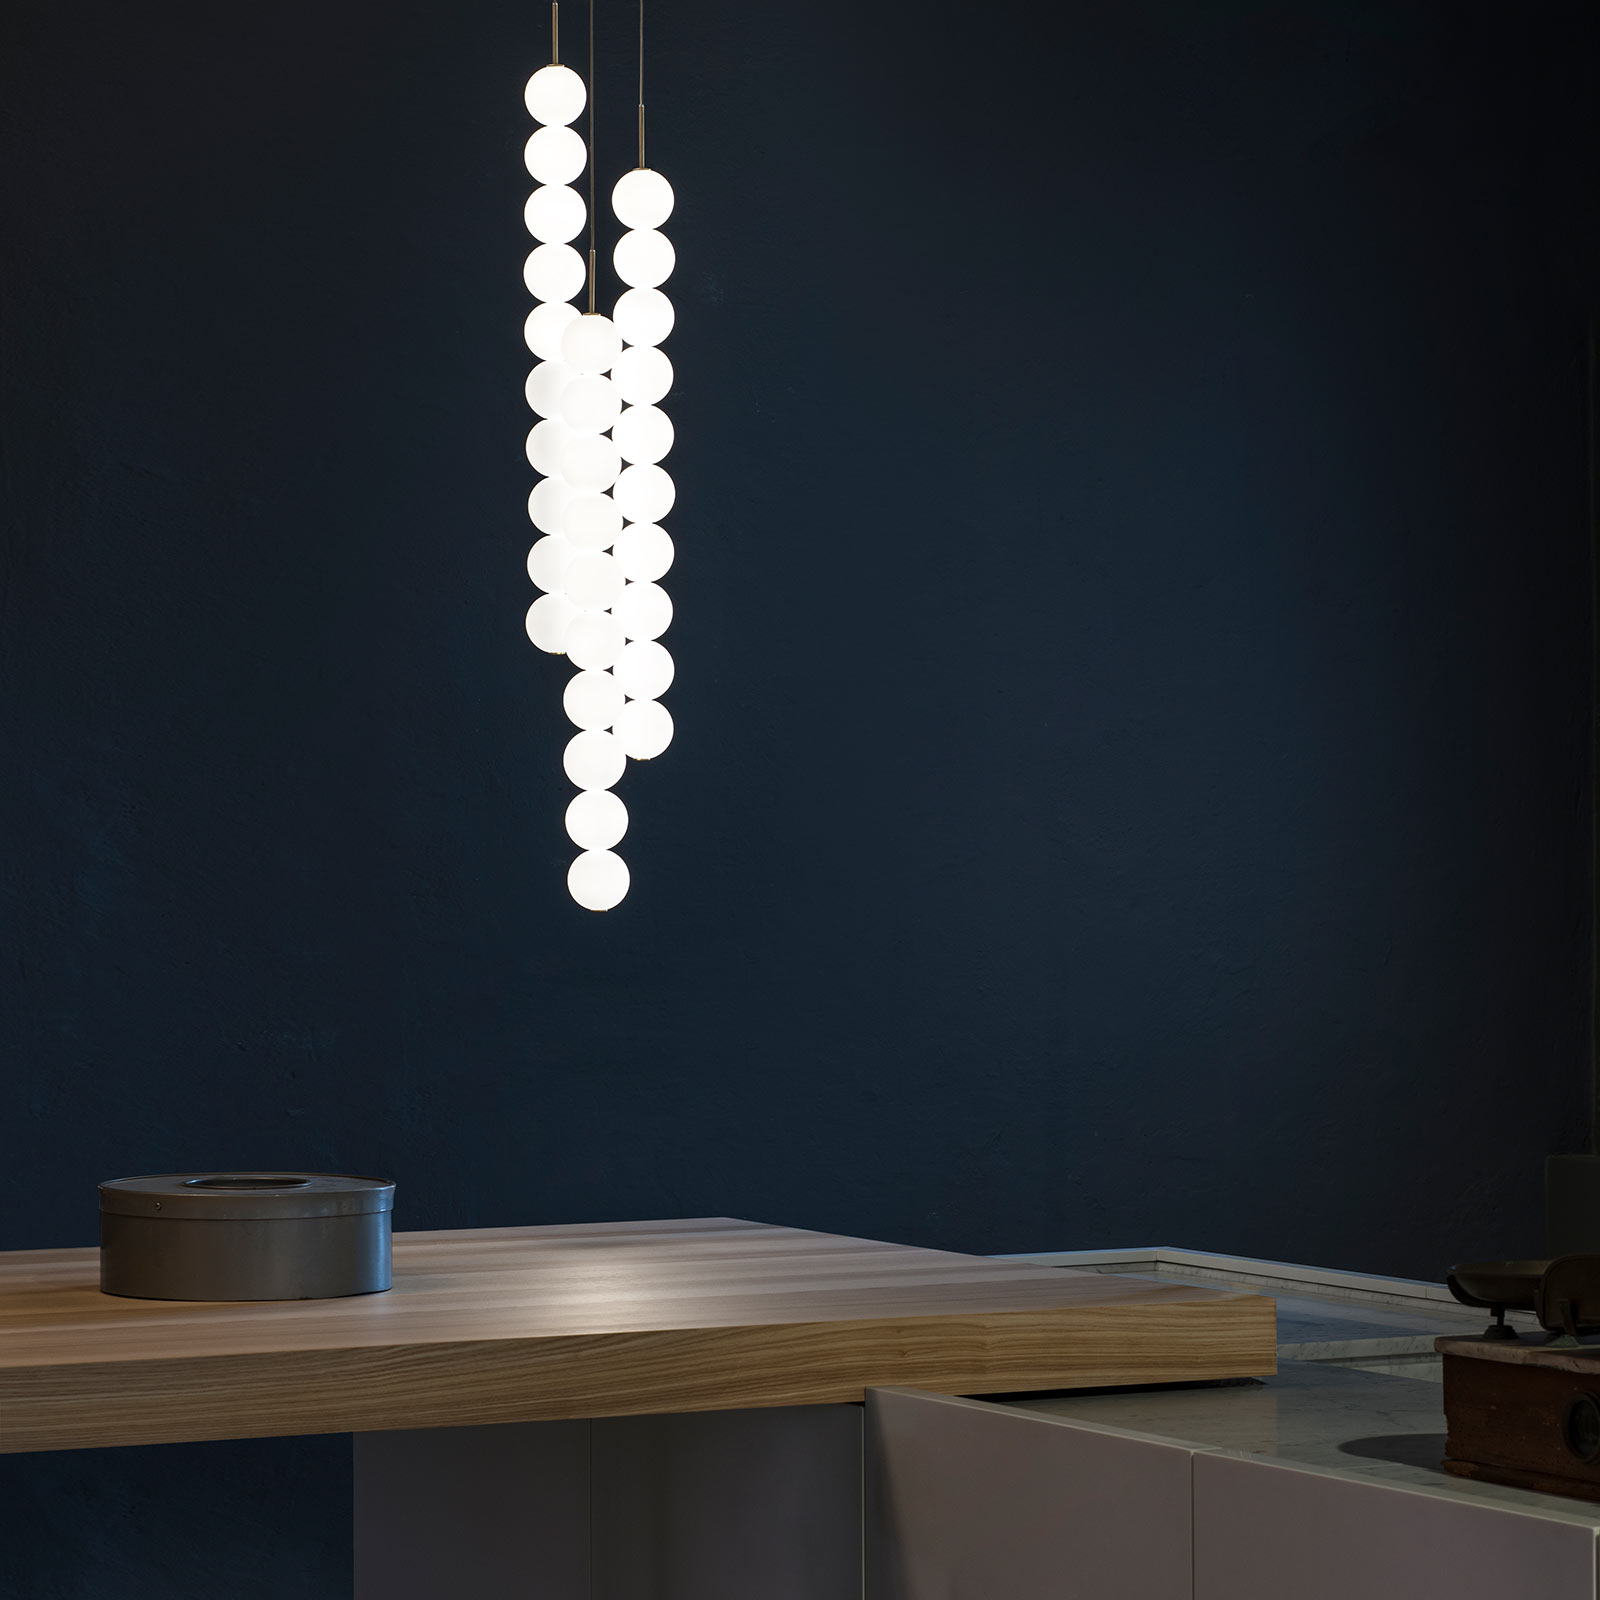 Terzani Abacus hanglamp, messing, 3x10 ballen